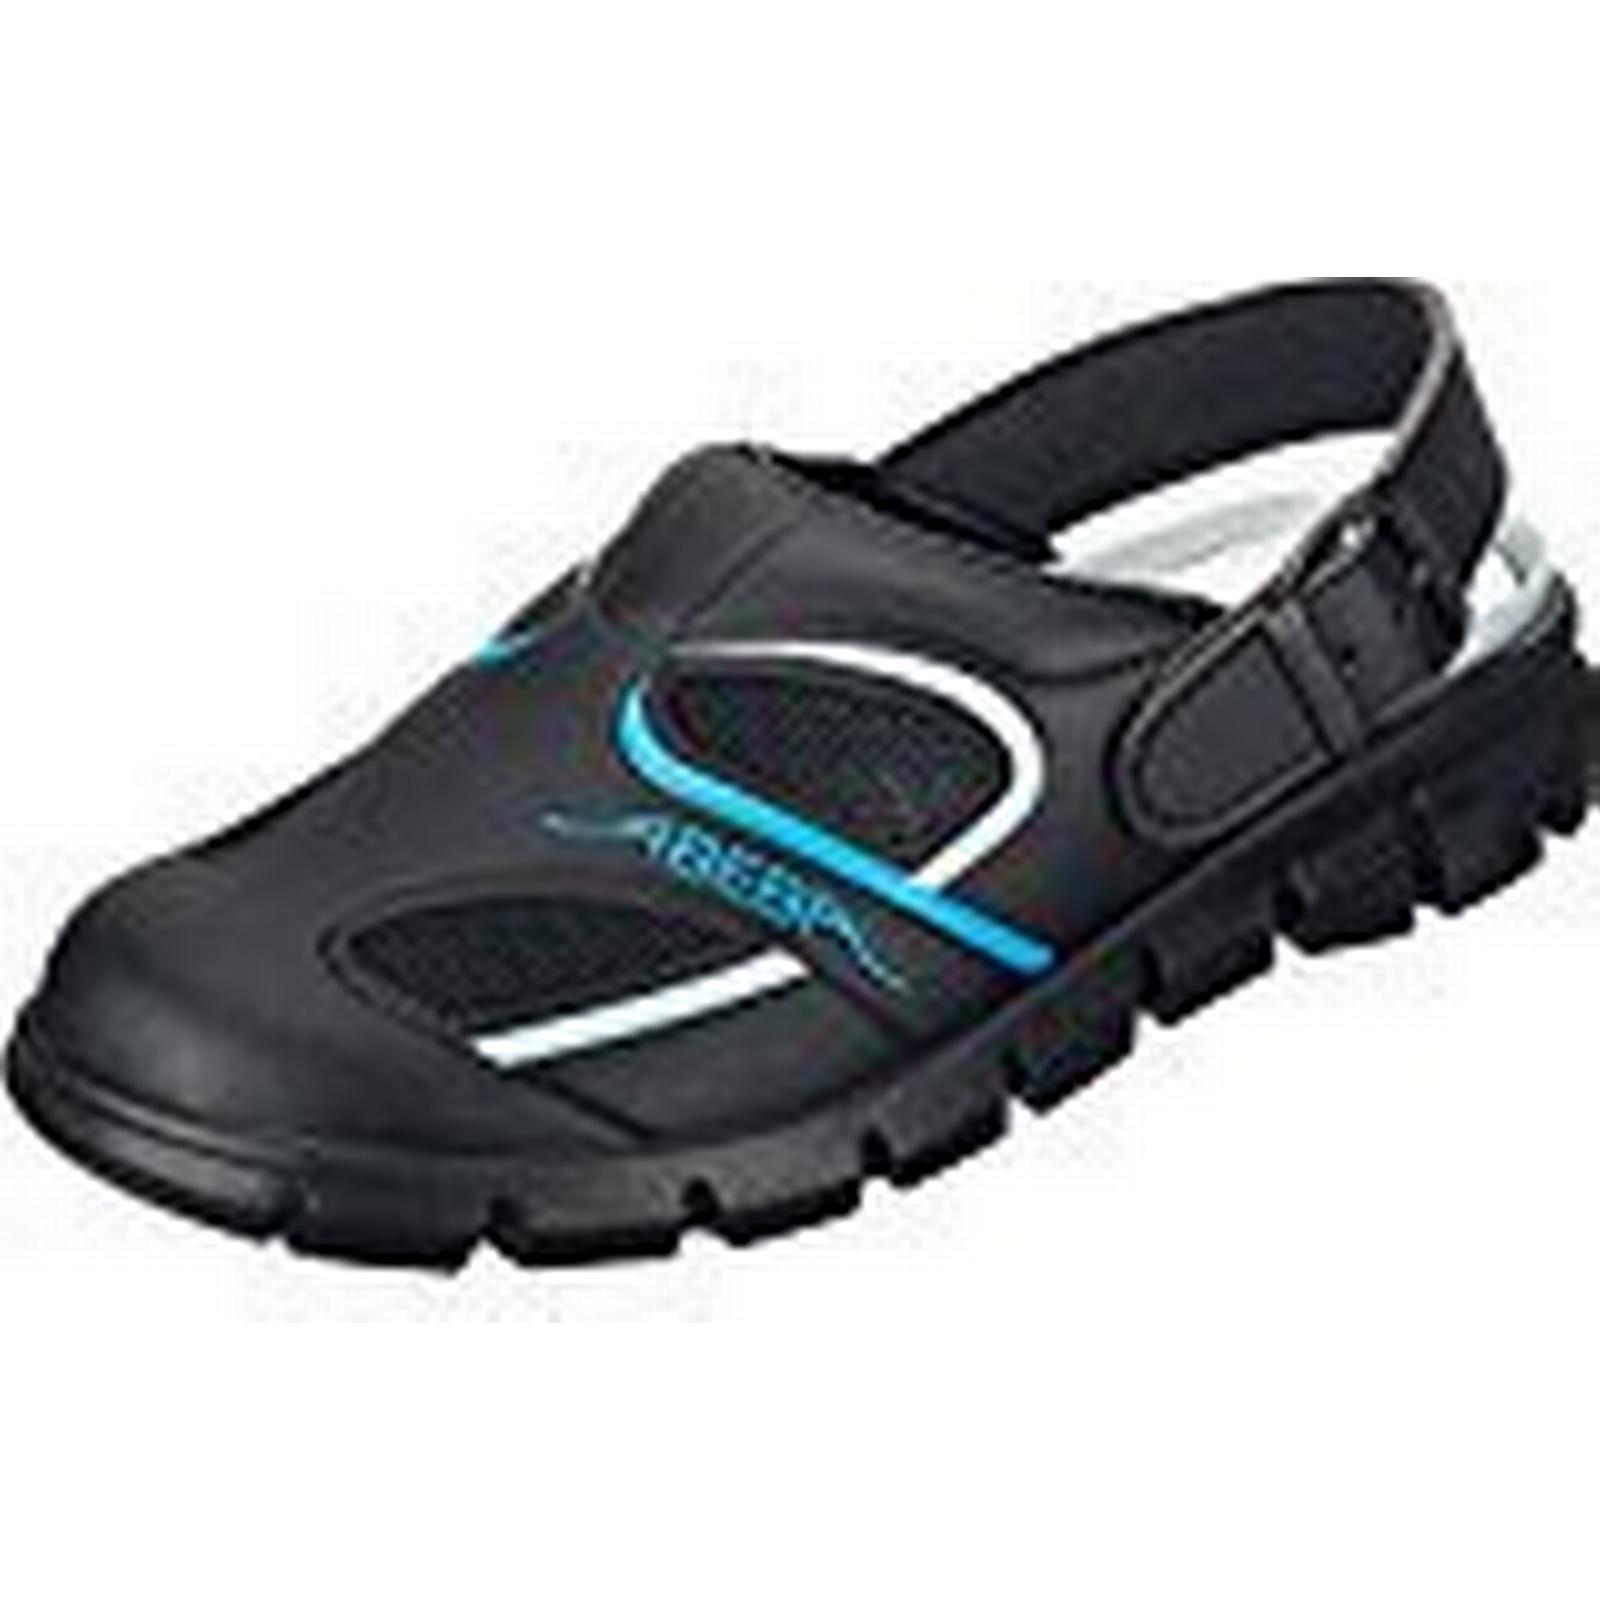 Abeba 7341-41 Size Shoe 41 Dynamic Occupational Clog Shoe Size - Black/Blue 87f797